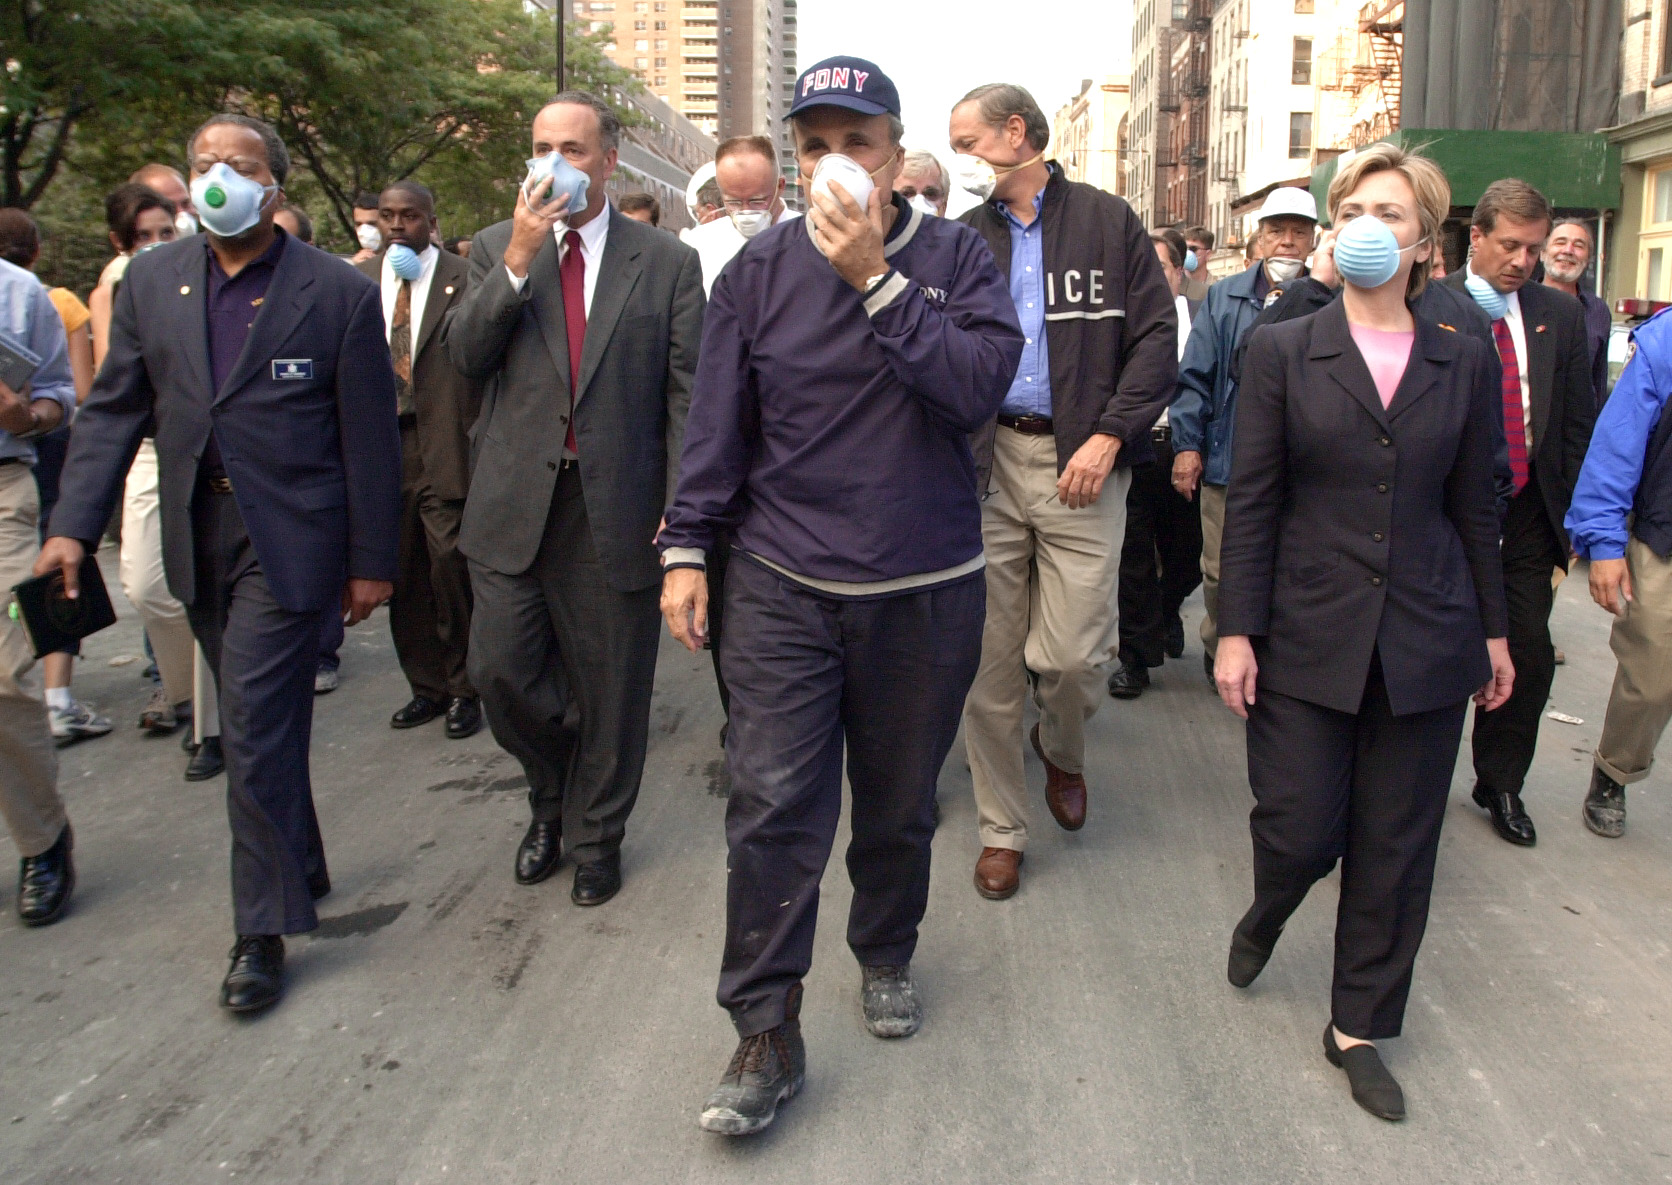 New York City Mayor Rudolph Giuliani (C) leads US